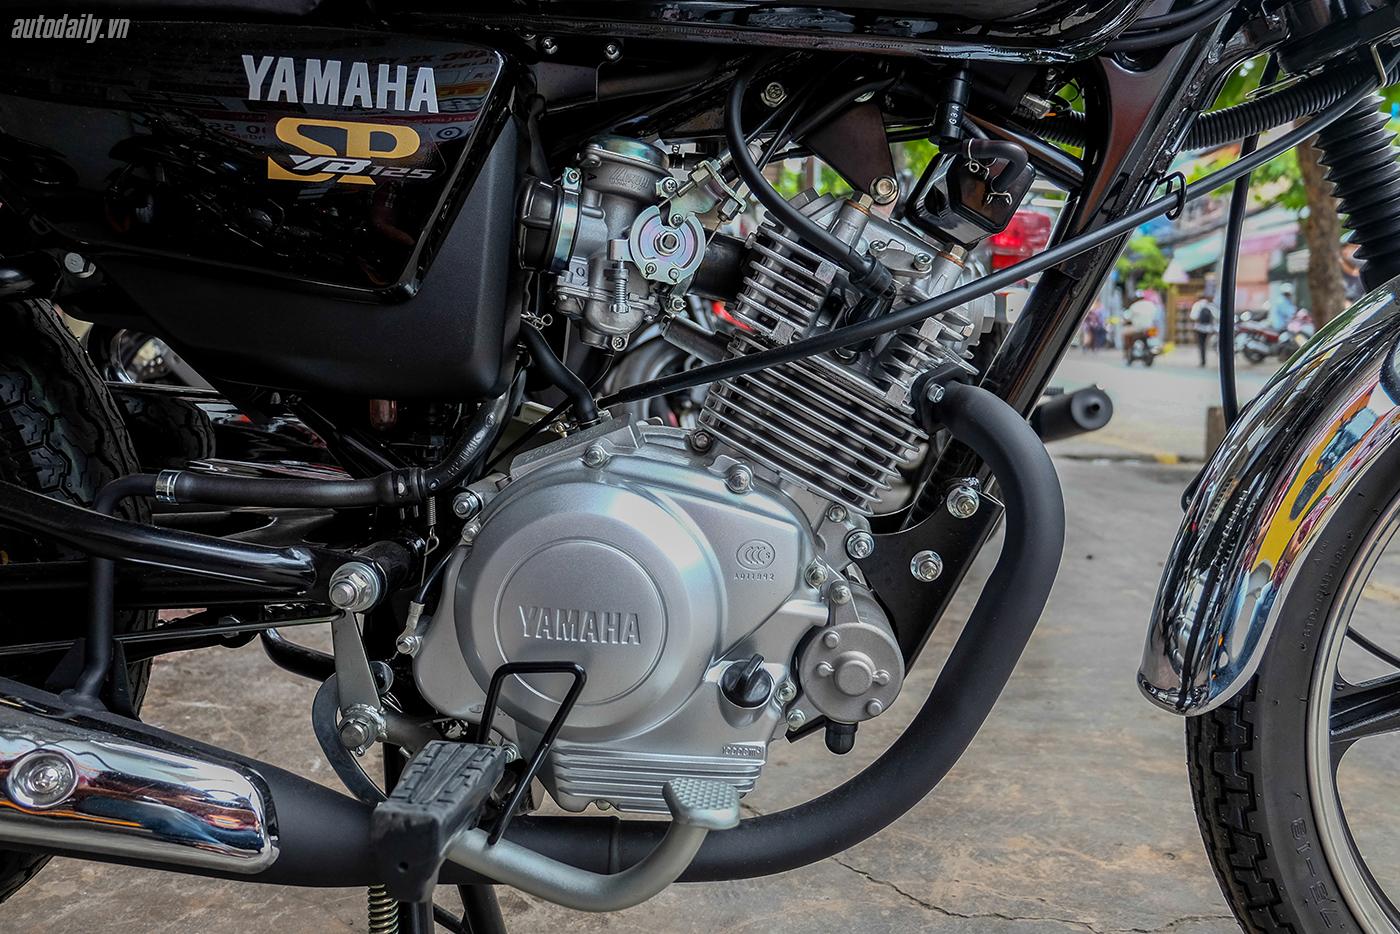 yamaha-yb125-sp-6.jpg